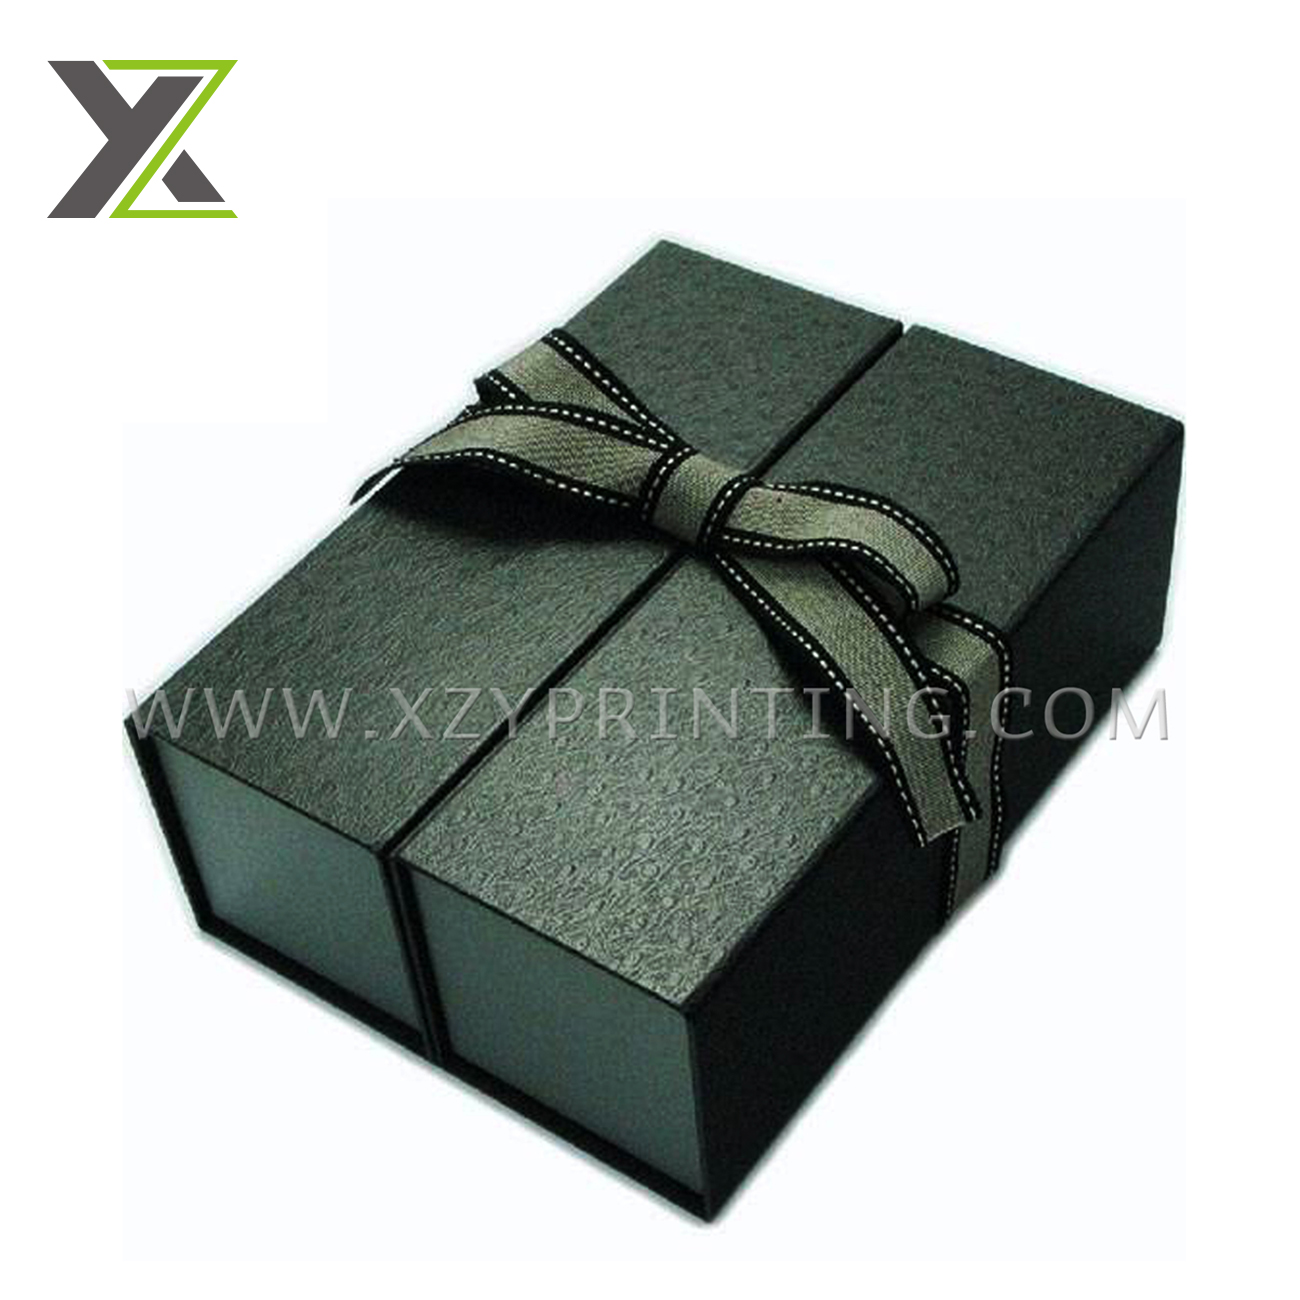 Rigid Tea Packaging Design Paper Box Set Buy Longjing Tea Packaging Box Set Green Tea Packing Gift Set Box Cosmetic Gift Set Packaging Box Product On Alibaba Com